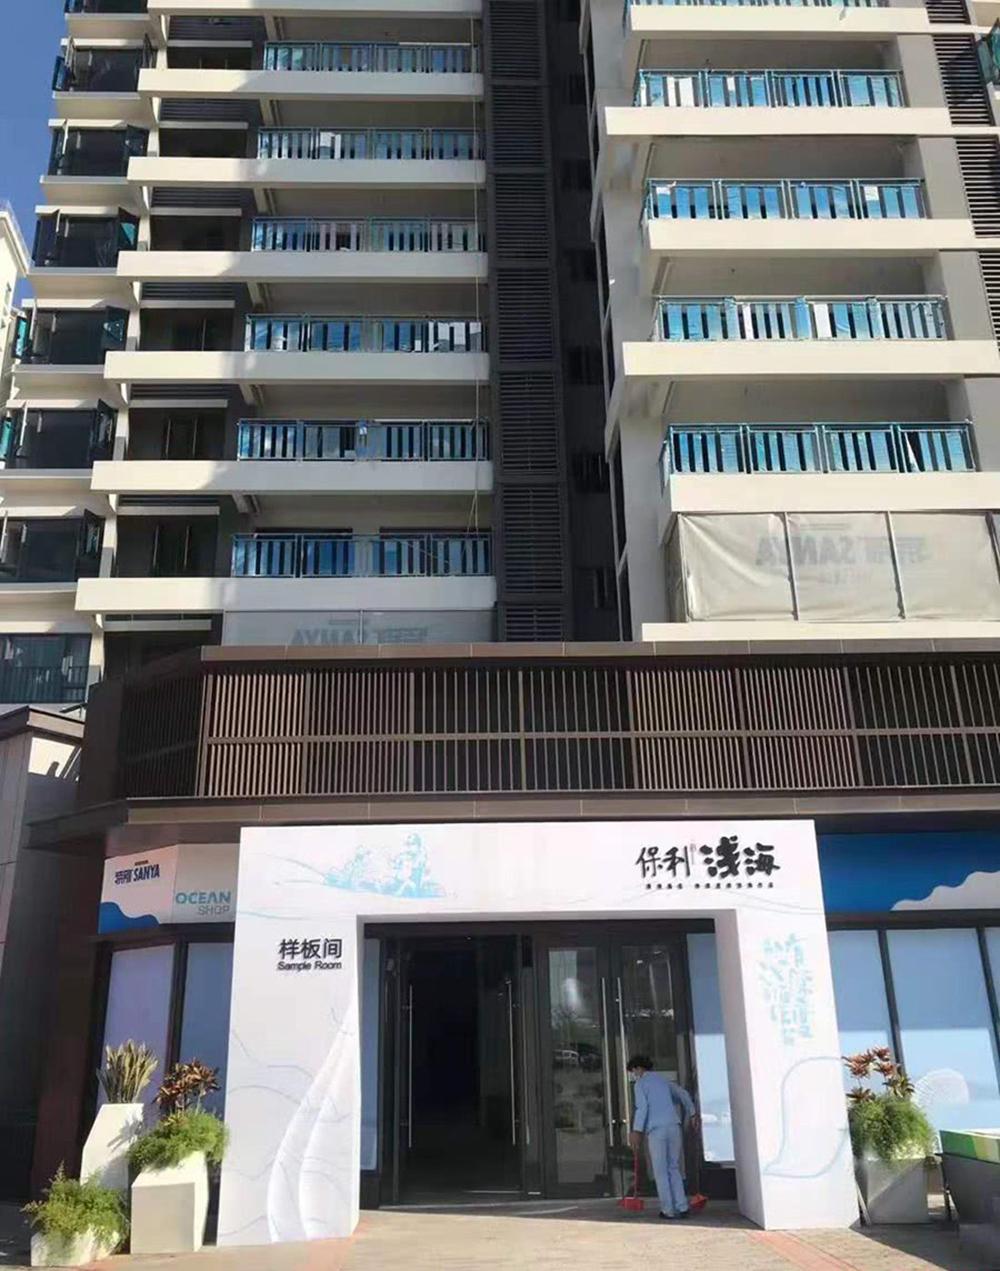 http://yuefangwangimg.oss-cn-hangzhou.aliyuncs.com/uploads/20210114/eadf6489cb233f150f35de85f1cdcf81Max.jpg